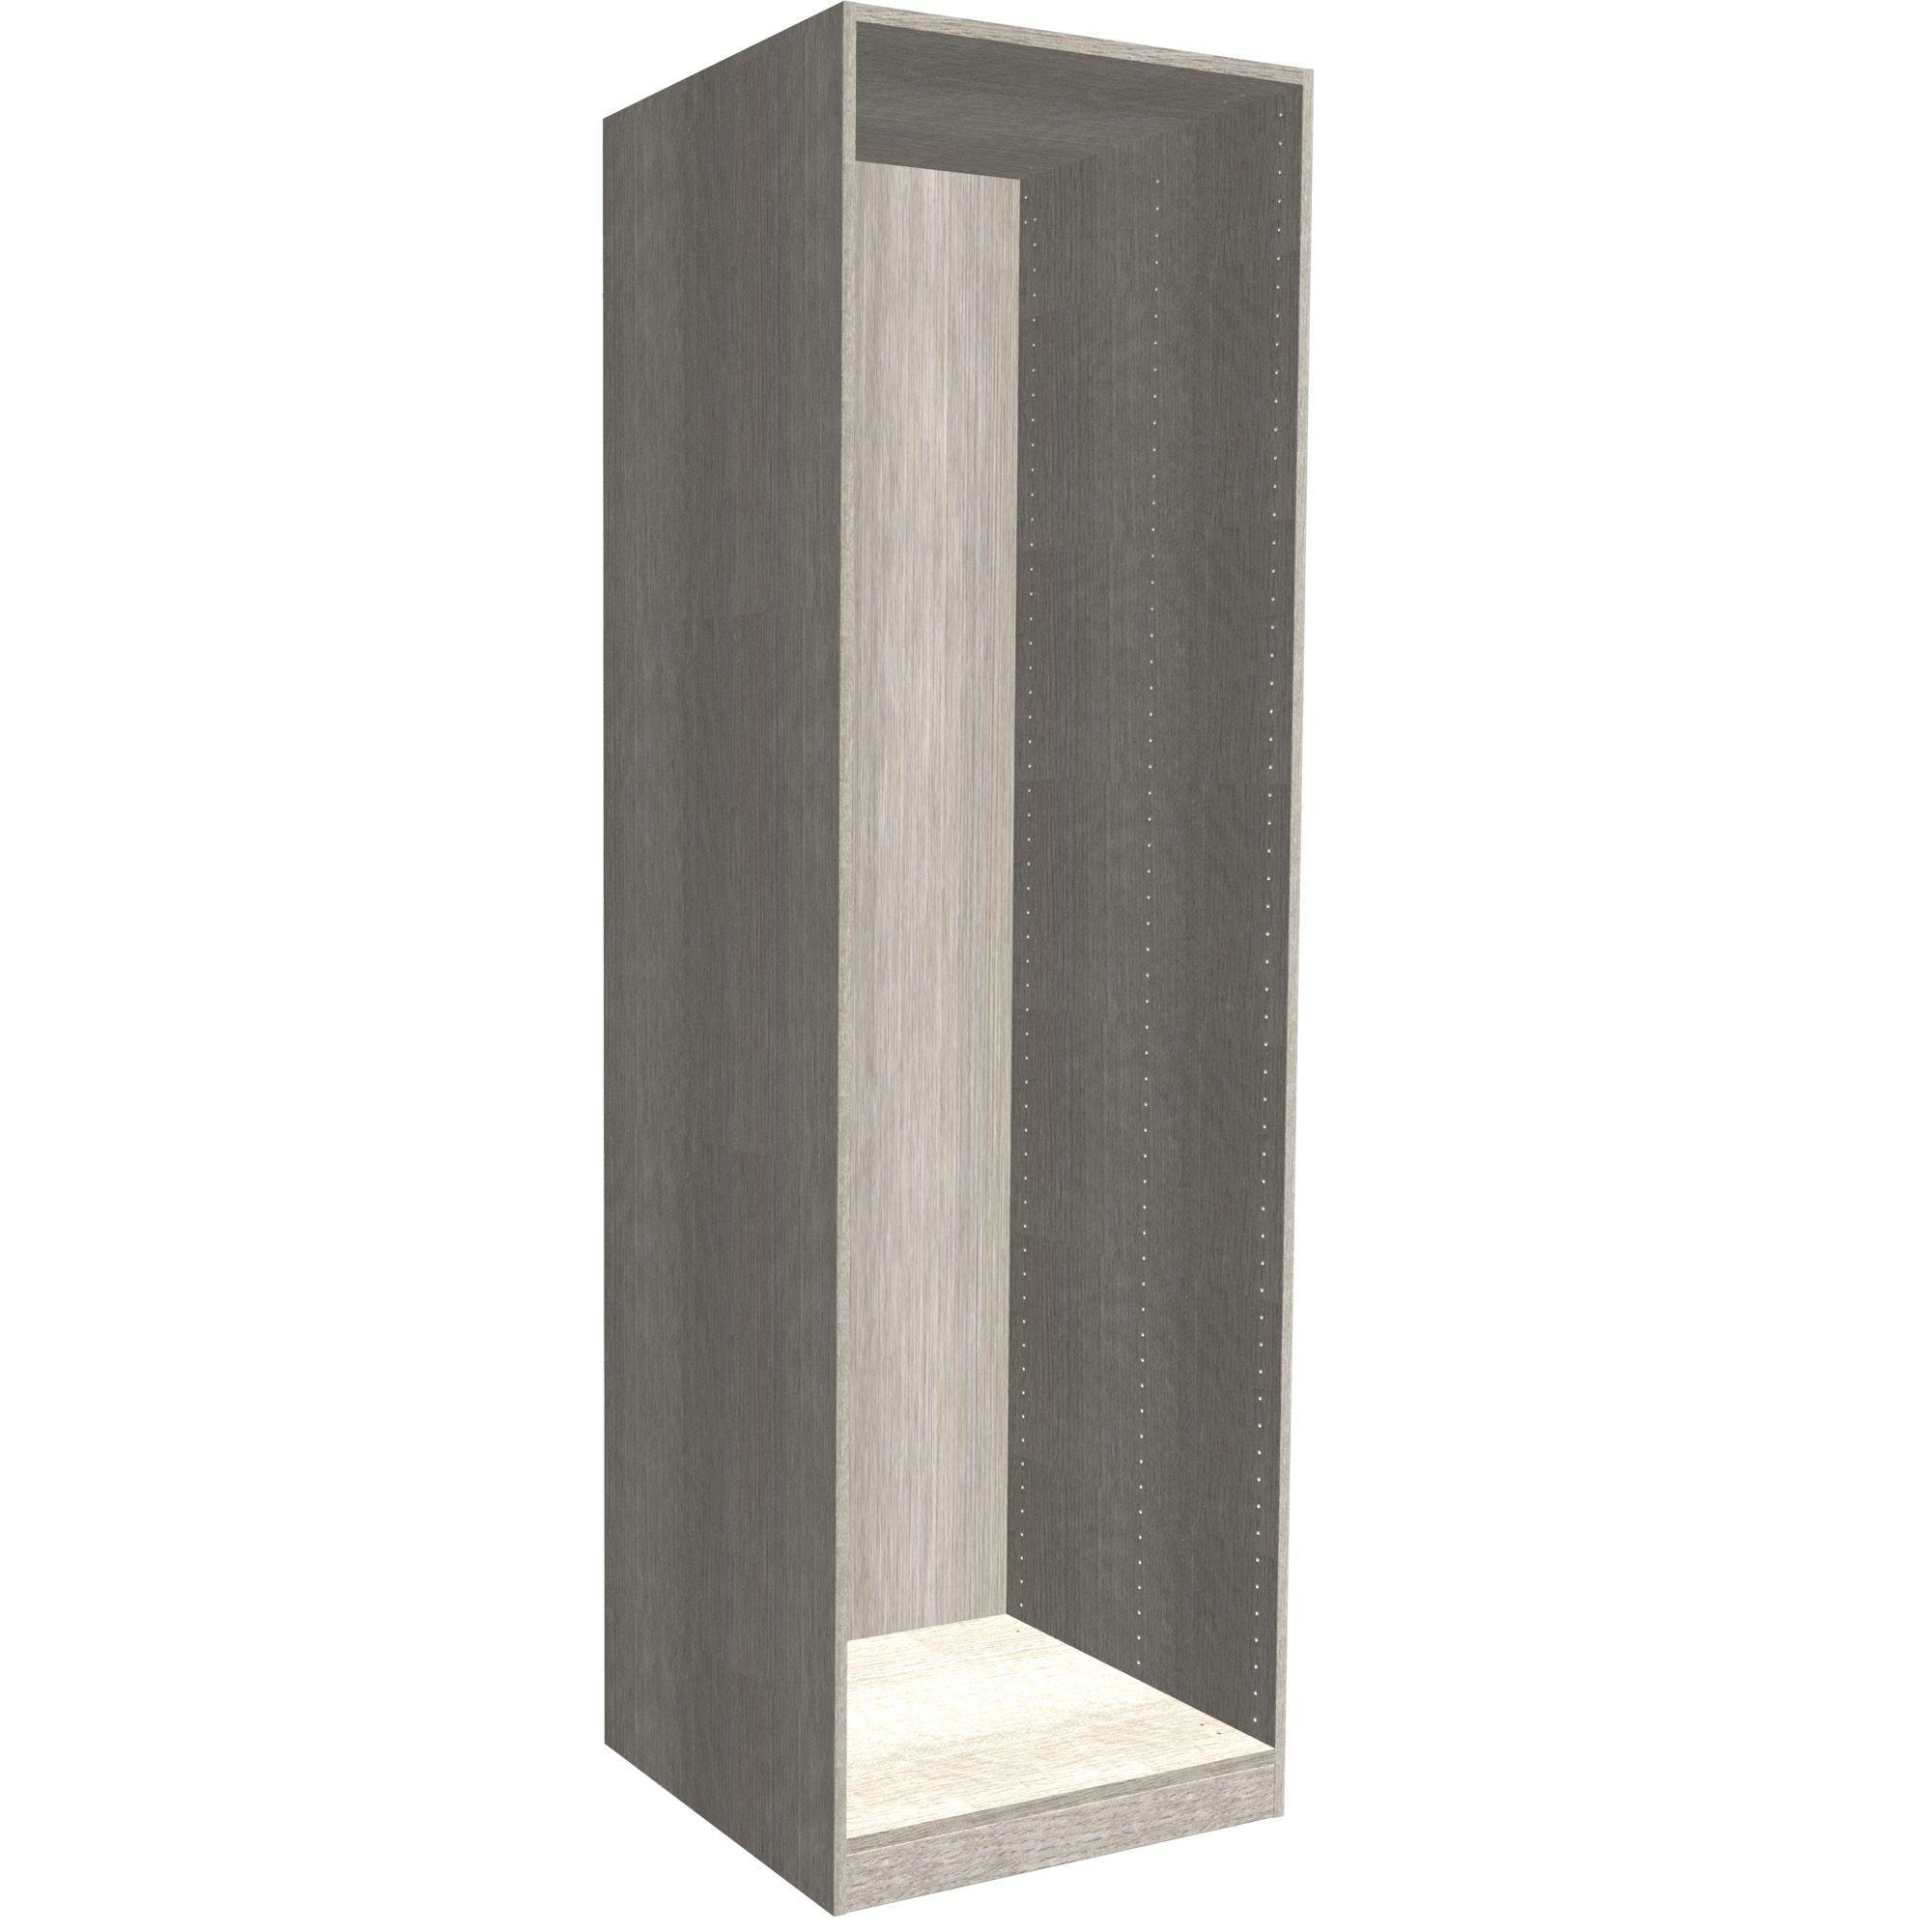 Darwin Modular Grey & Oak Effect Tall Wardrobe Cabinet (h)2356mm (w)500mm (d)566mm